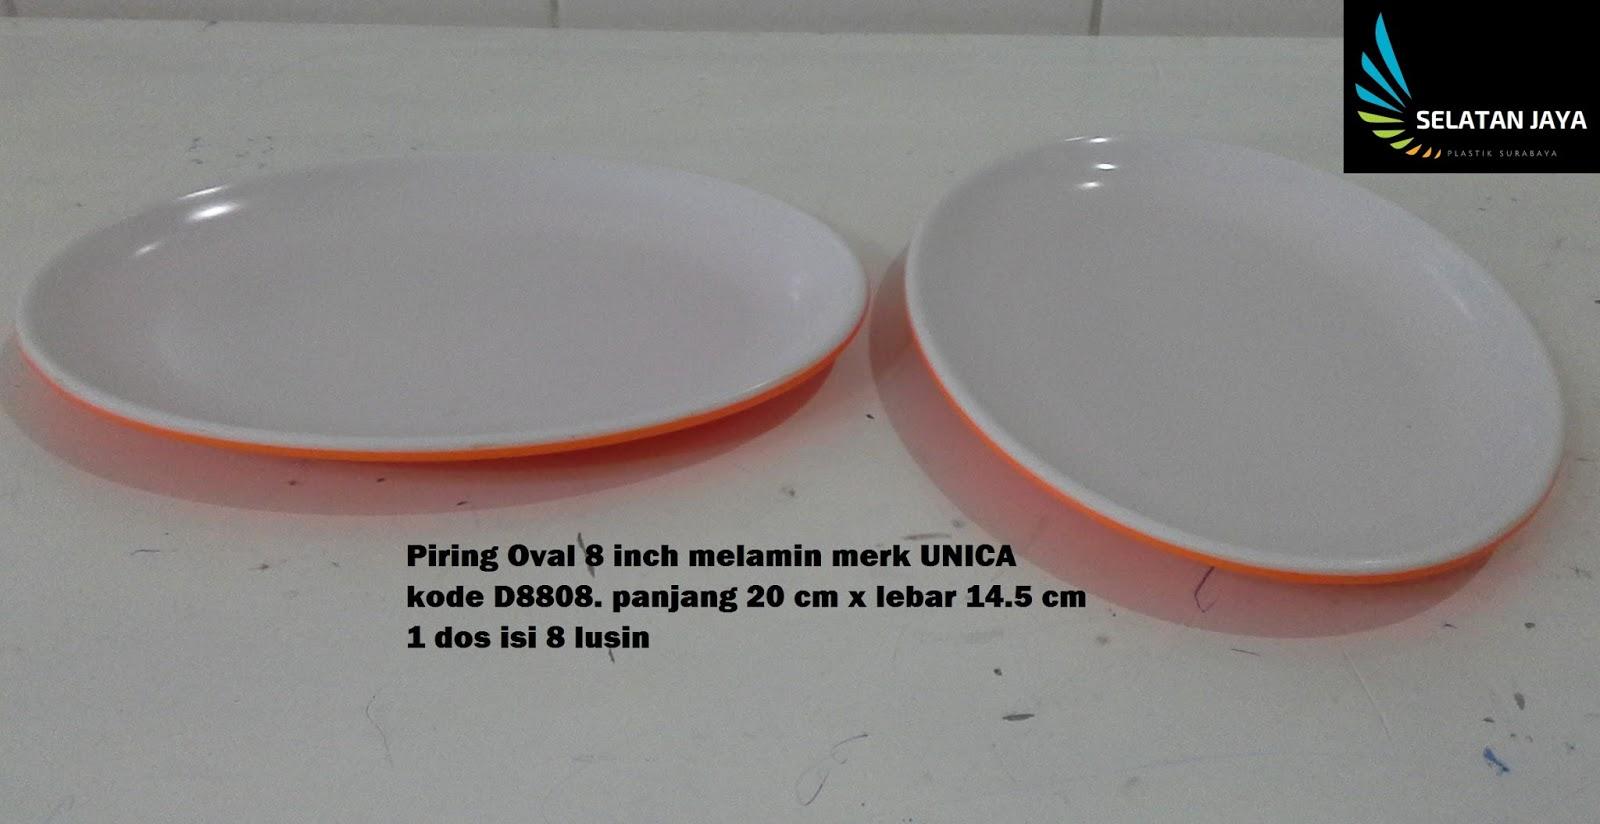 Piring oval melamin 8 inch merk UNICA kode D8808 putih orange. ukuran  panjang 20 cm x lebar 14.5 cm x tinggi 1.5 cm. 1 dus isi 8 lusin. piring  oval untuk ... 243e043f0b